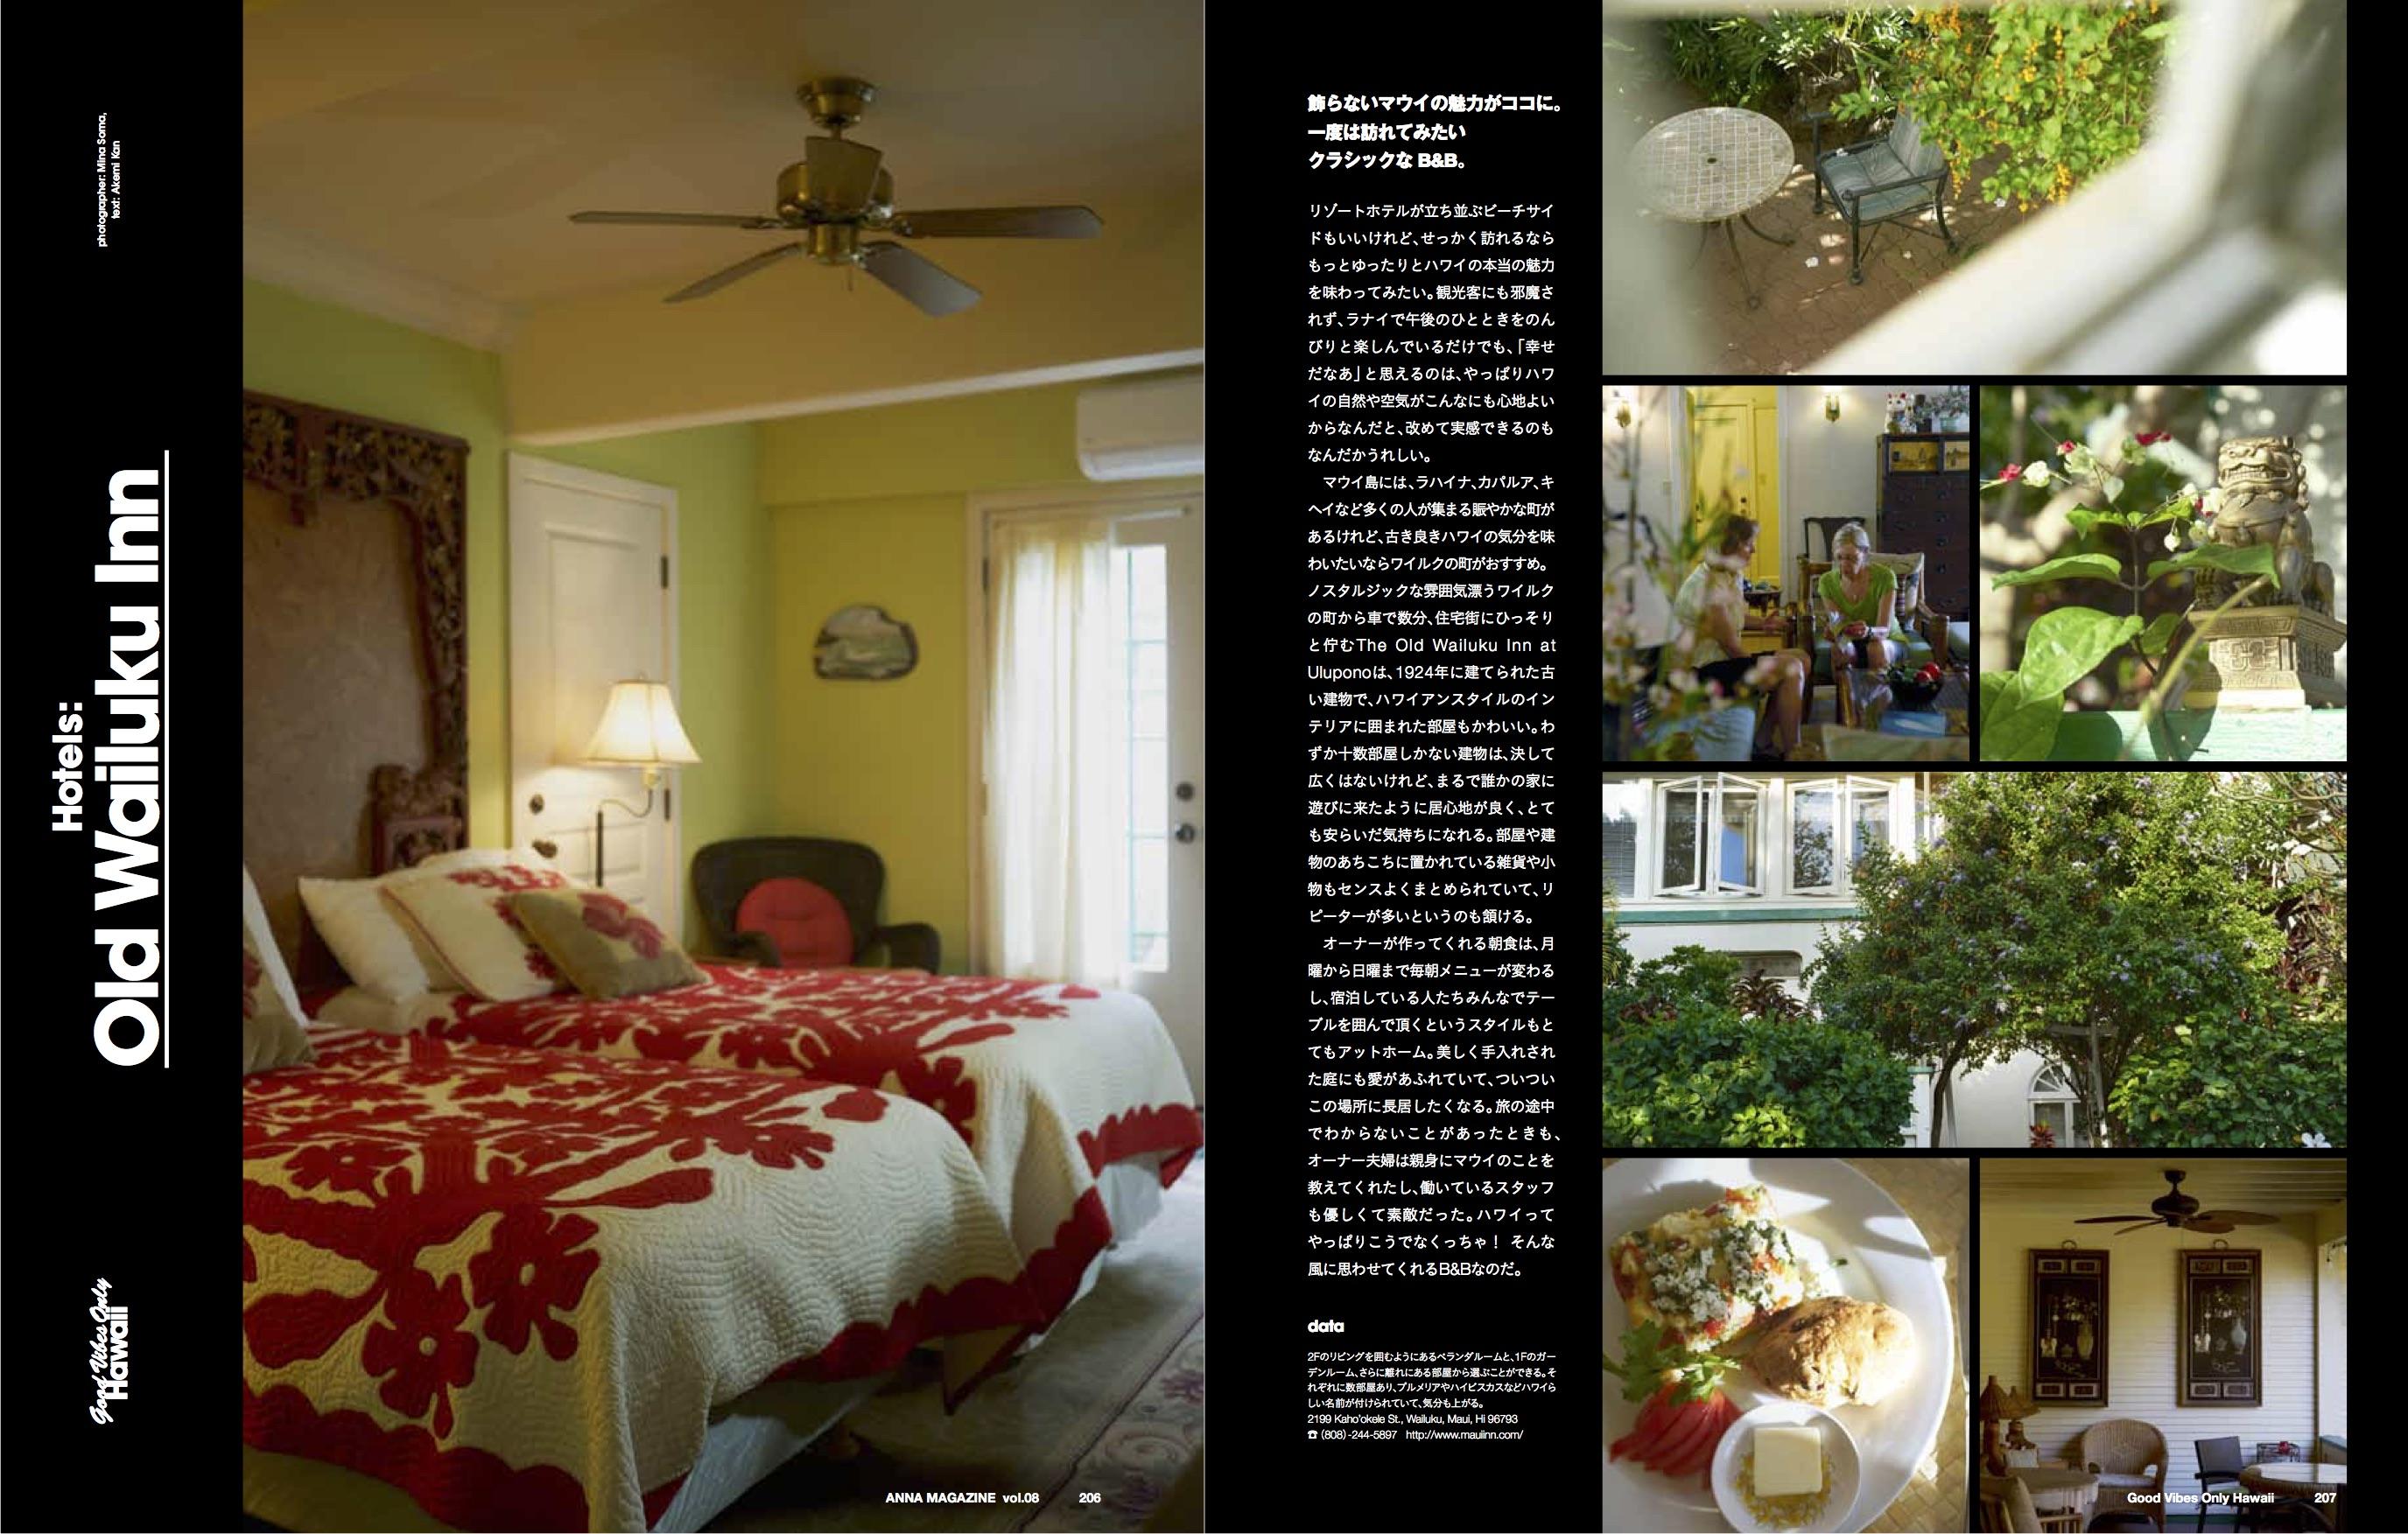 anna magazine vol.8 P104